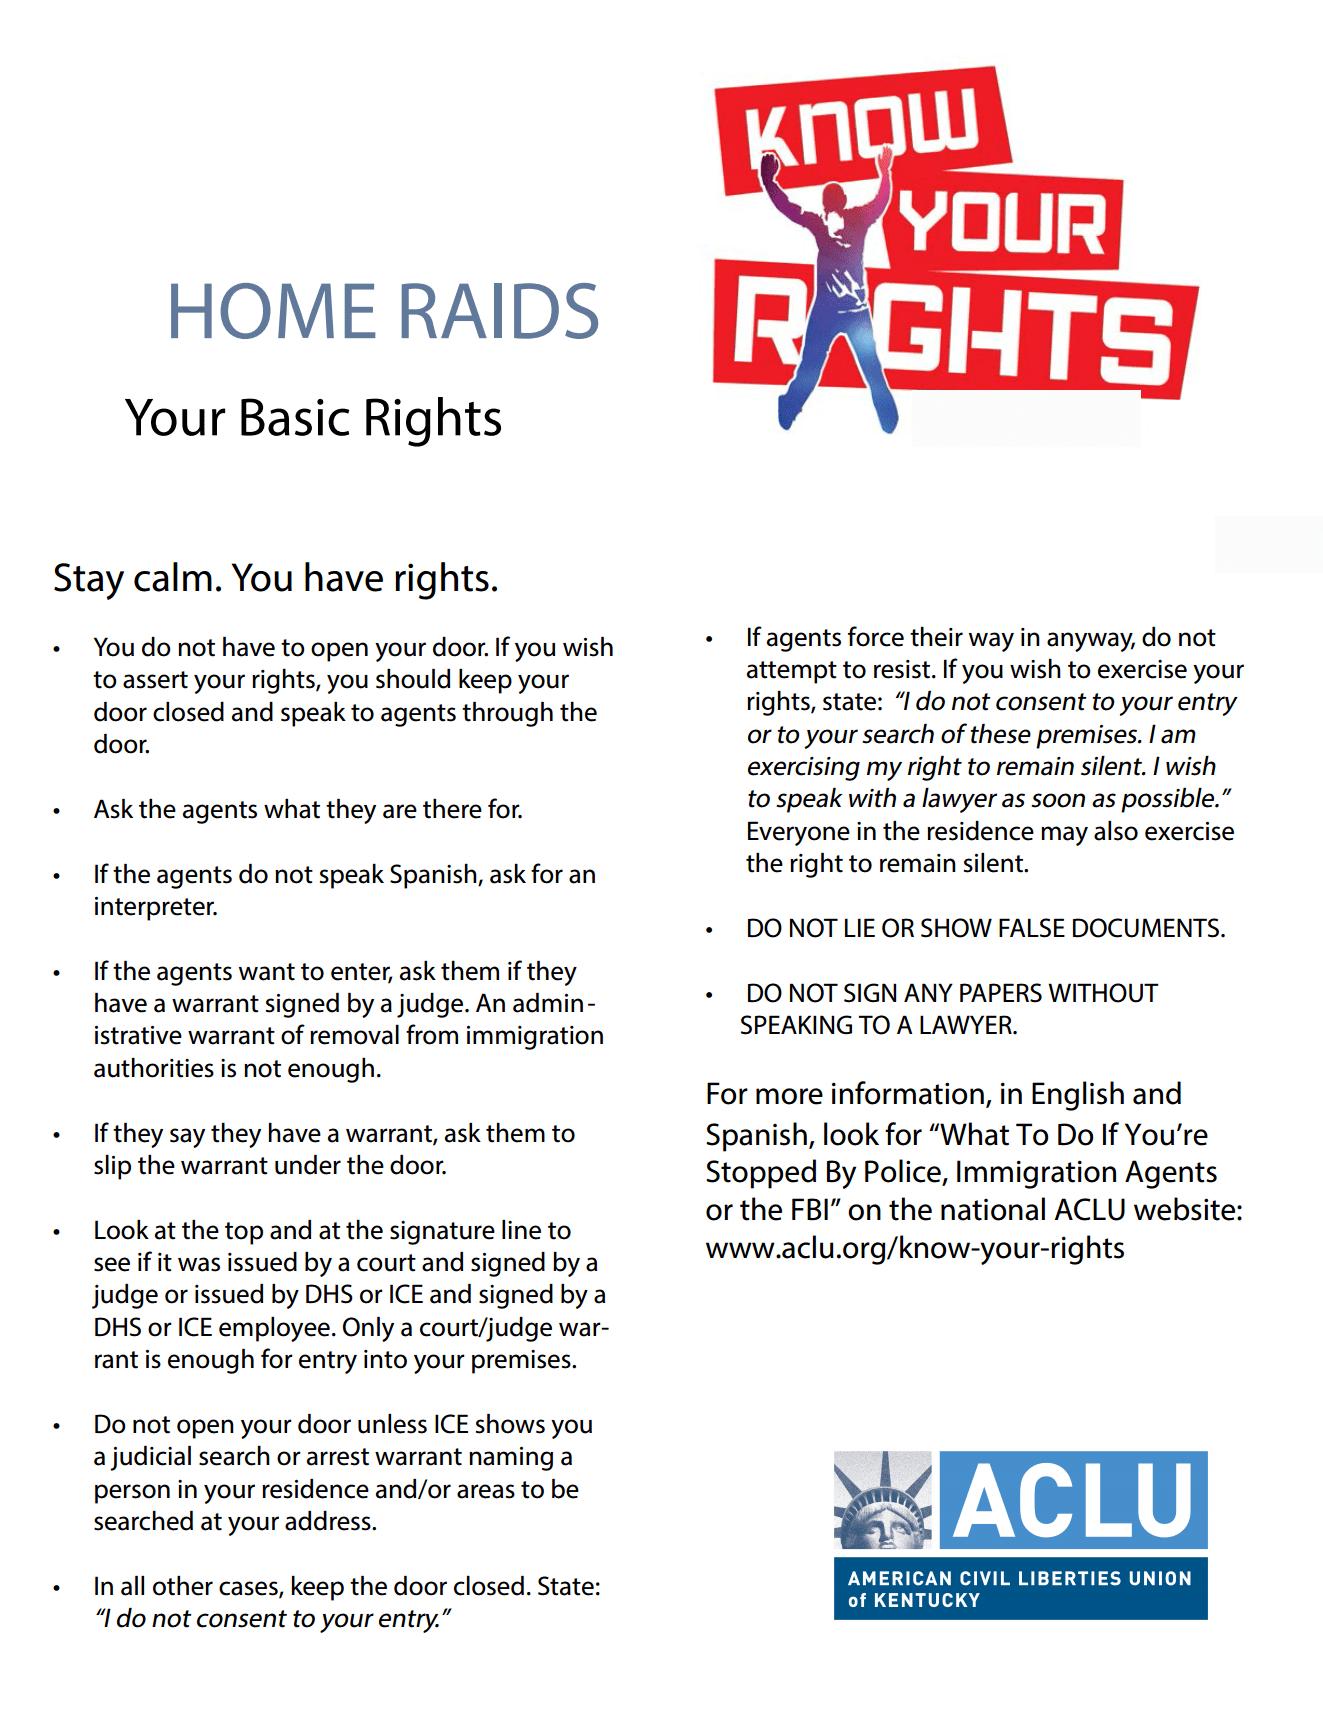 Home raids